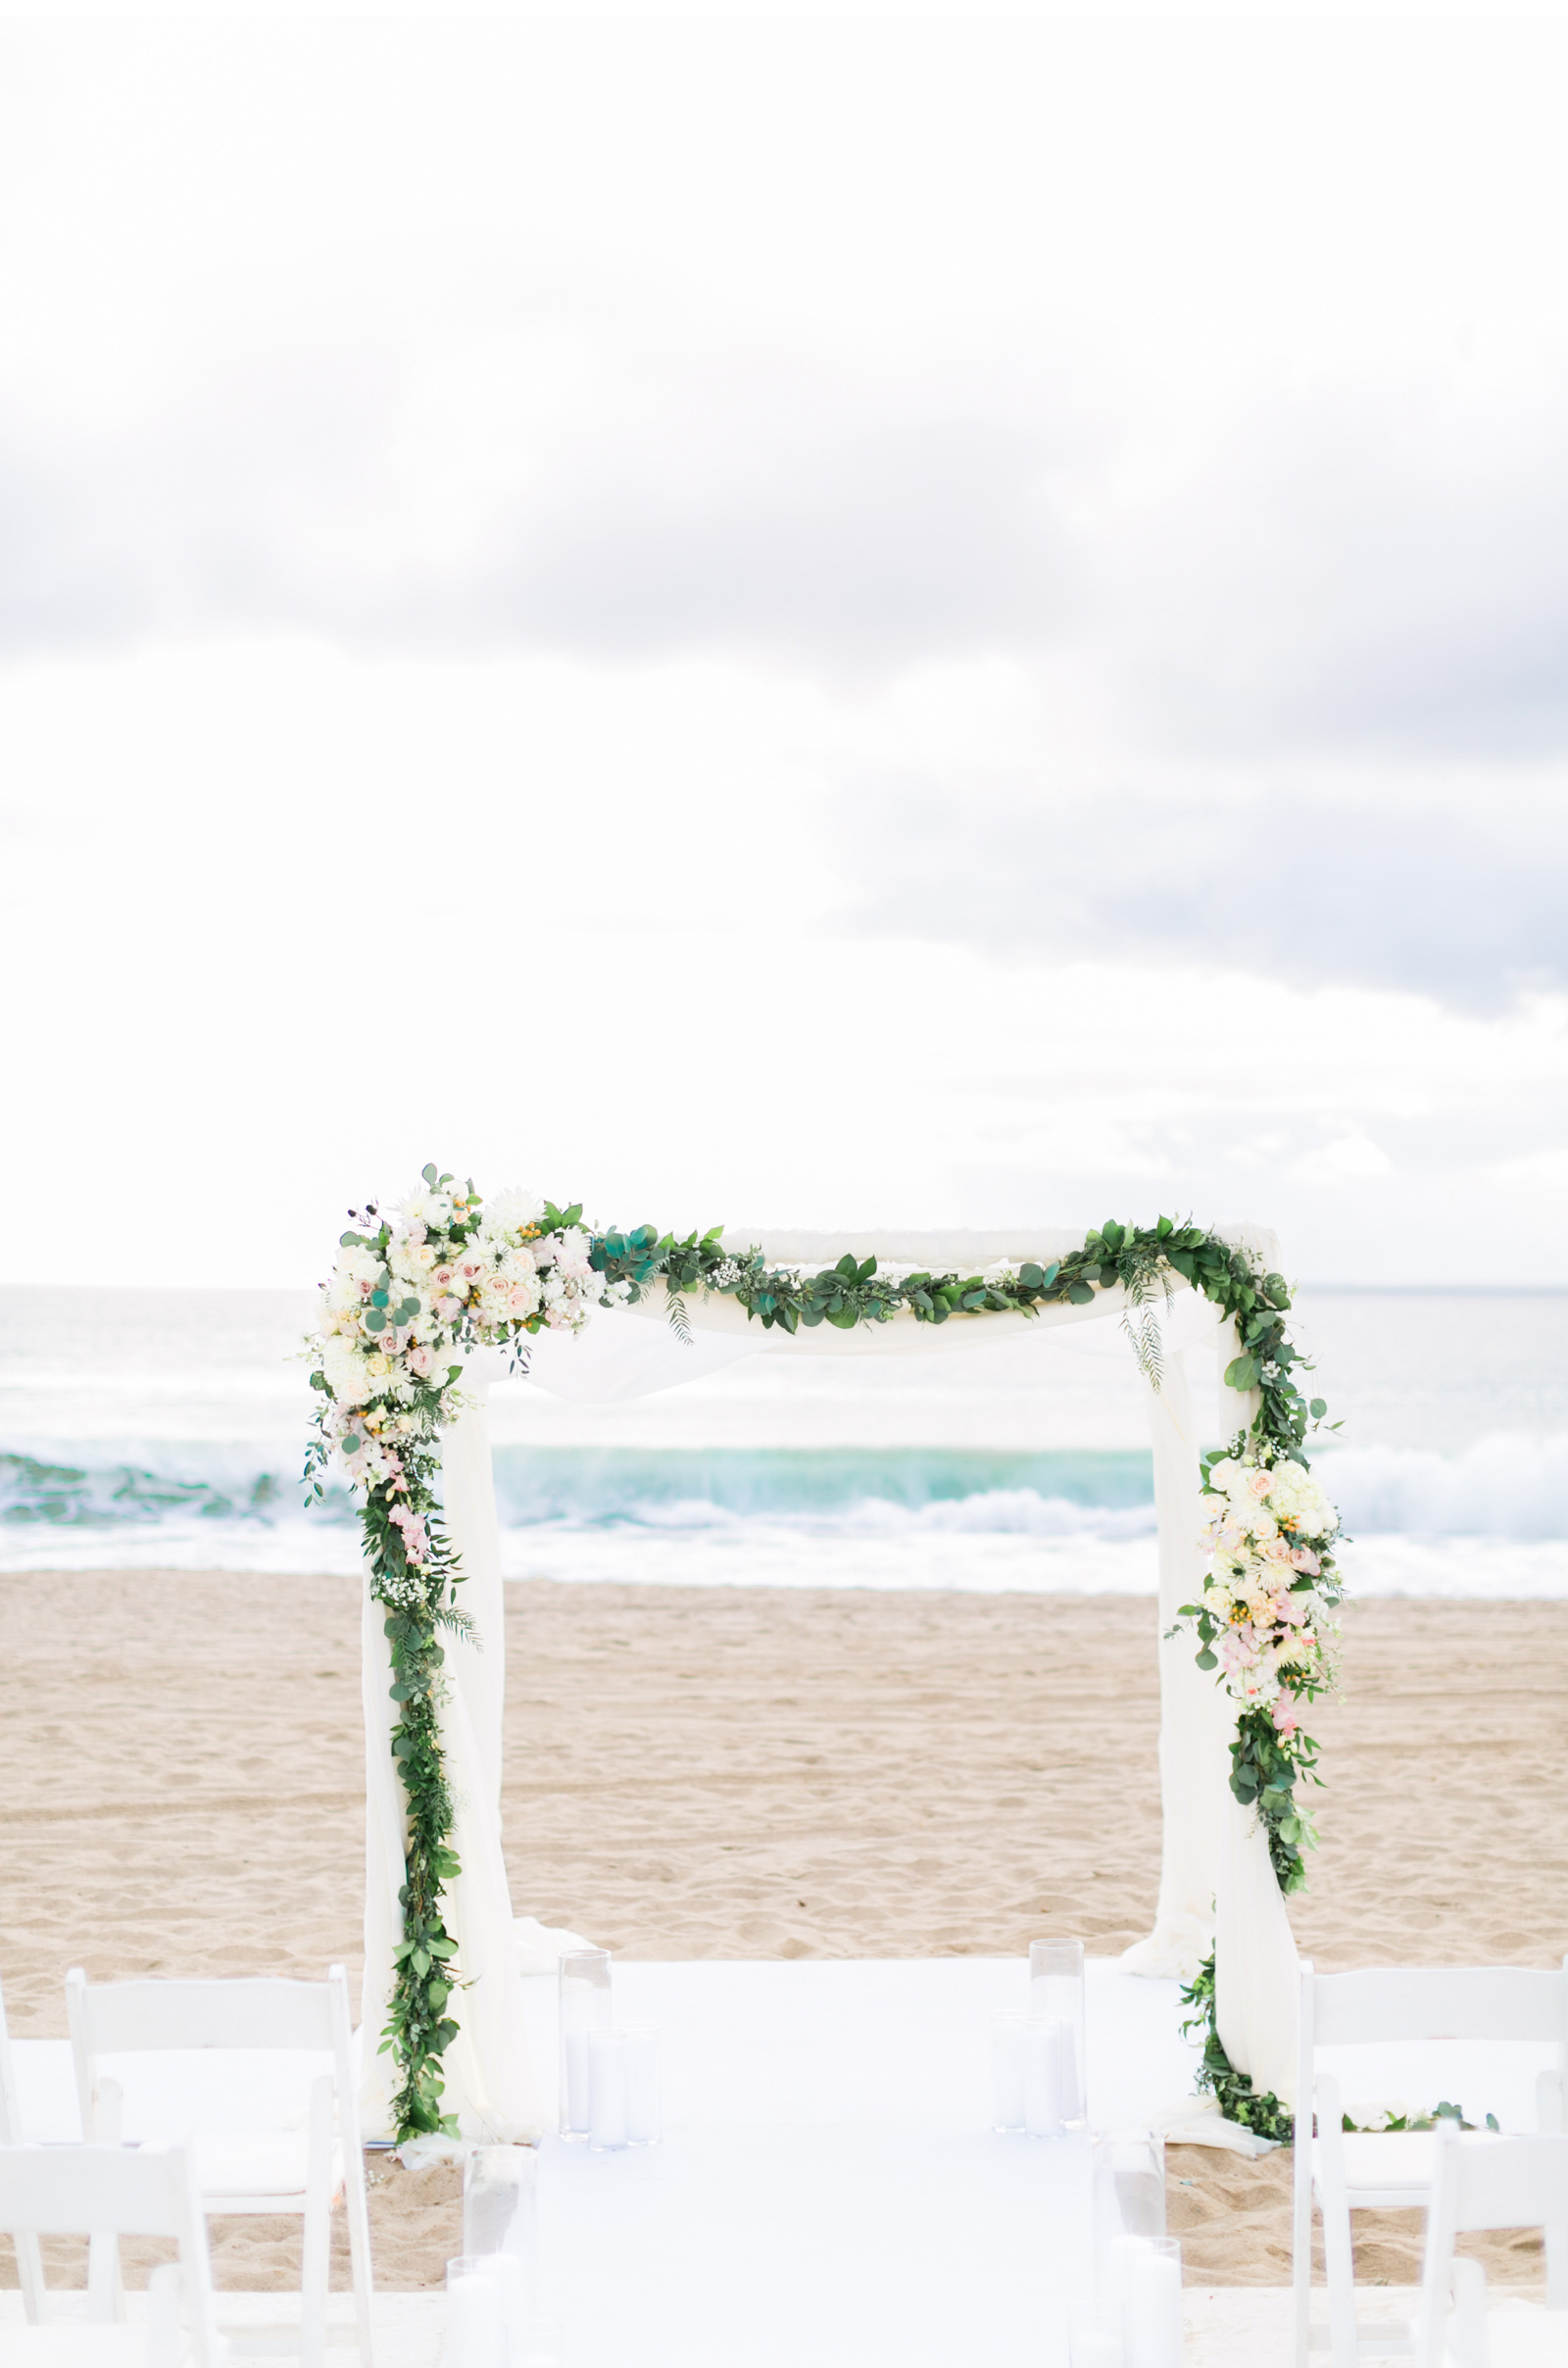 Sunset-Restaurant-Malibu-Beach-Wedding-Natalie-Schutt-Photography_11.jpg